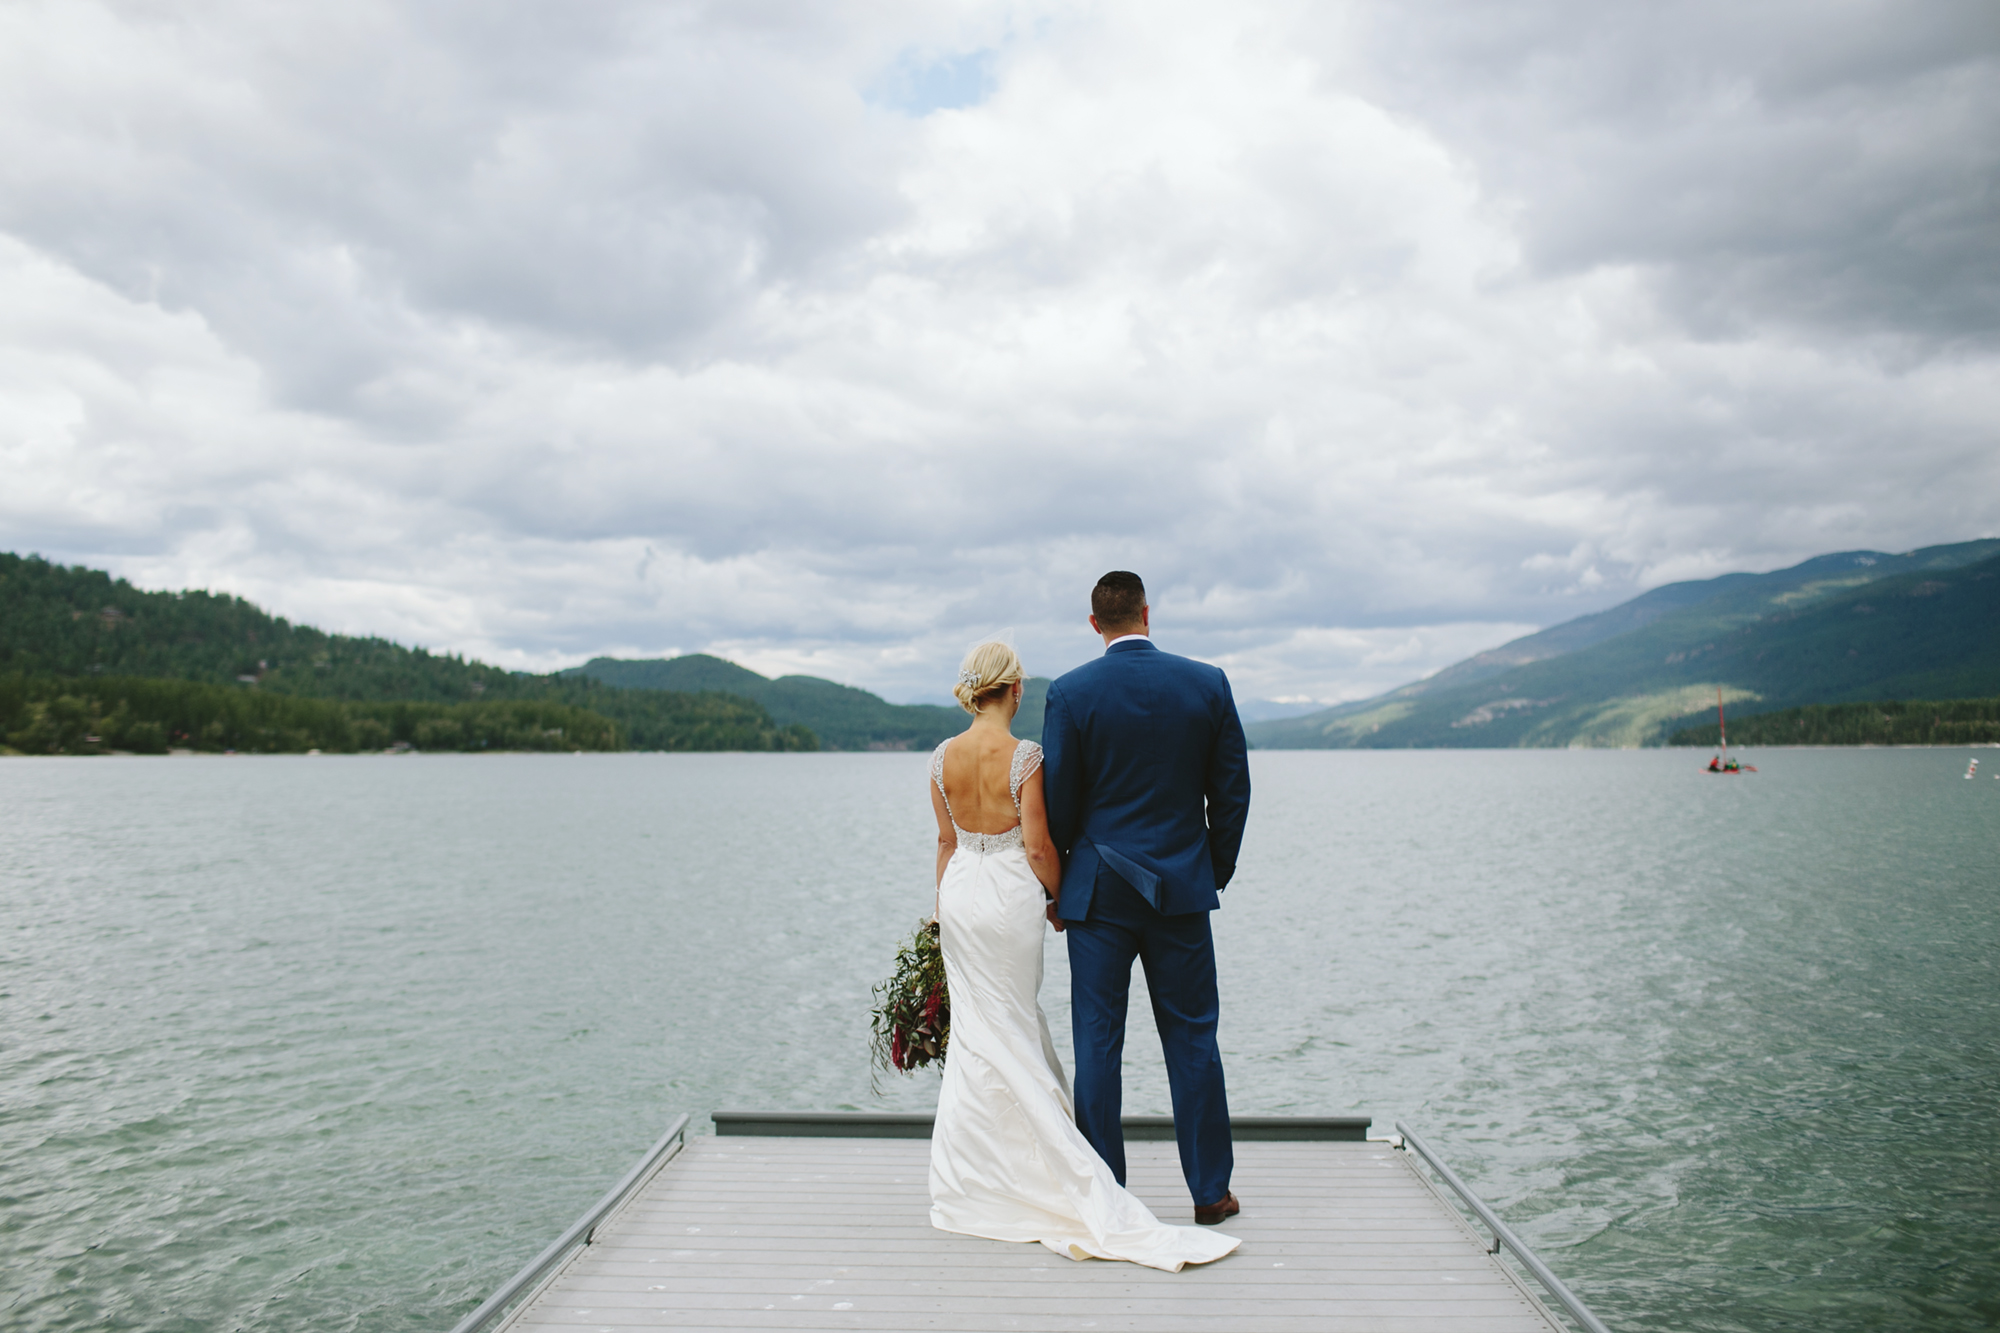 mountain wedding, lake wedding, alberta wedding photographer, lake wedding, blue suit, vintage gown